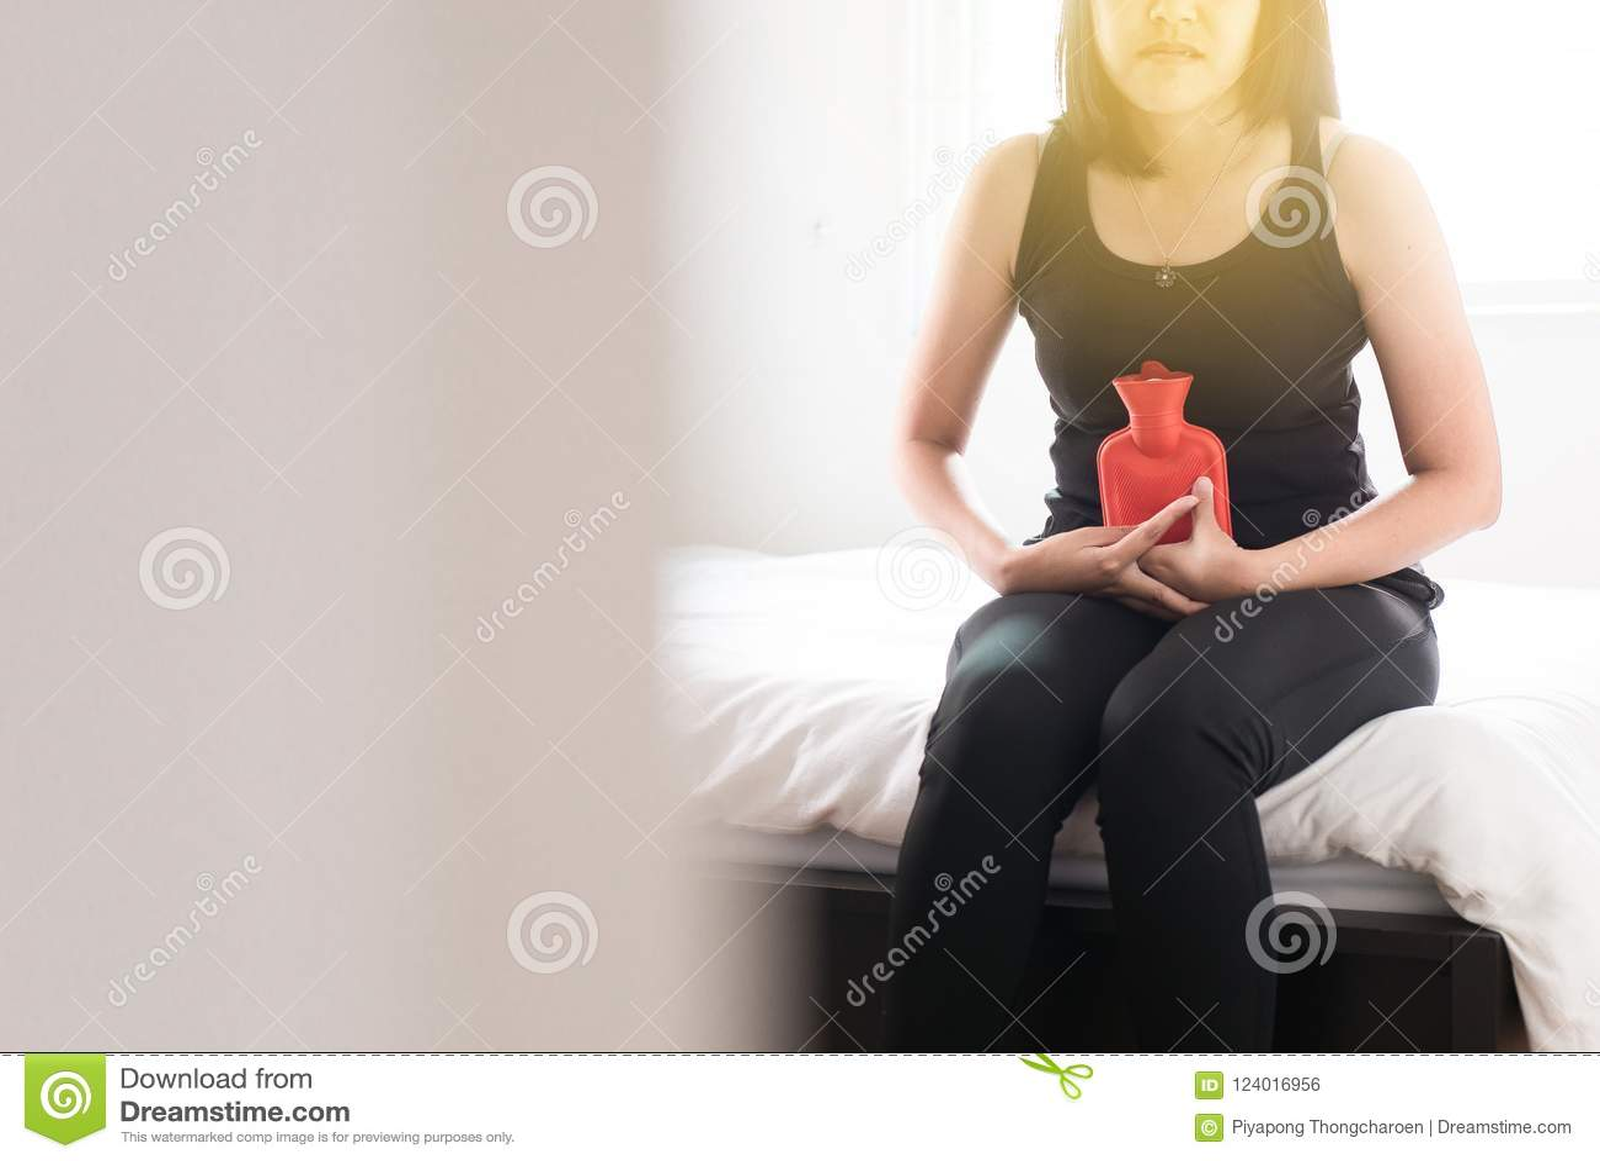 Lisa ann nude massage